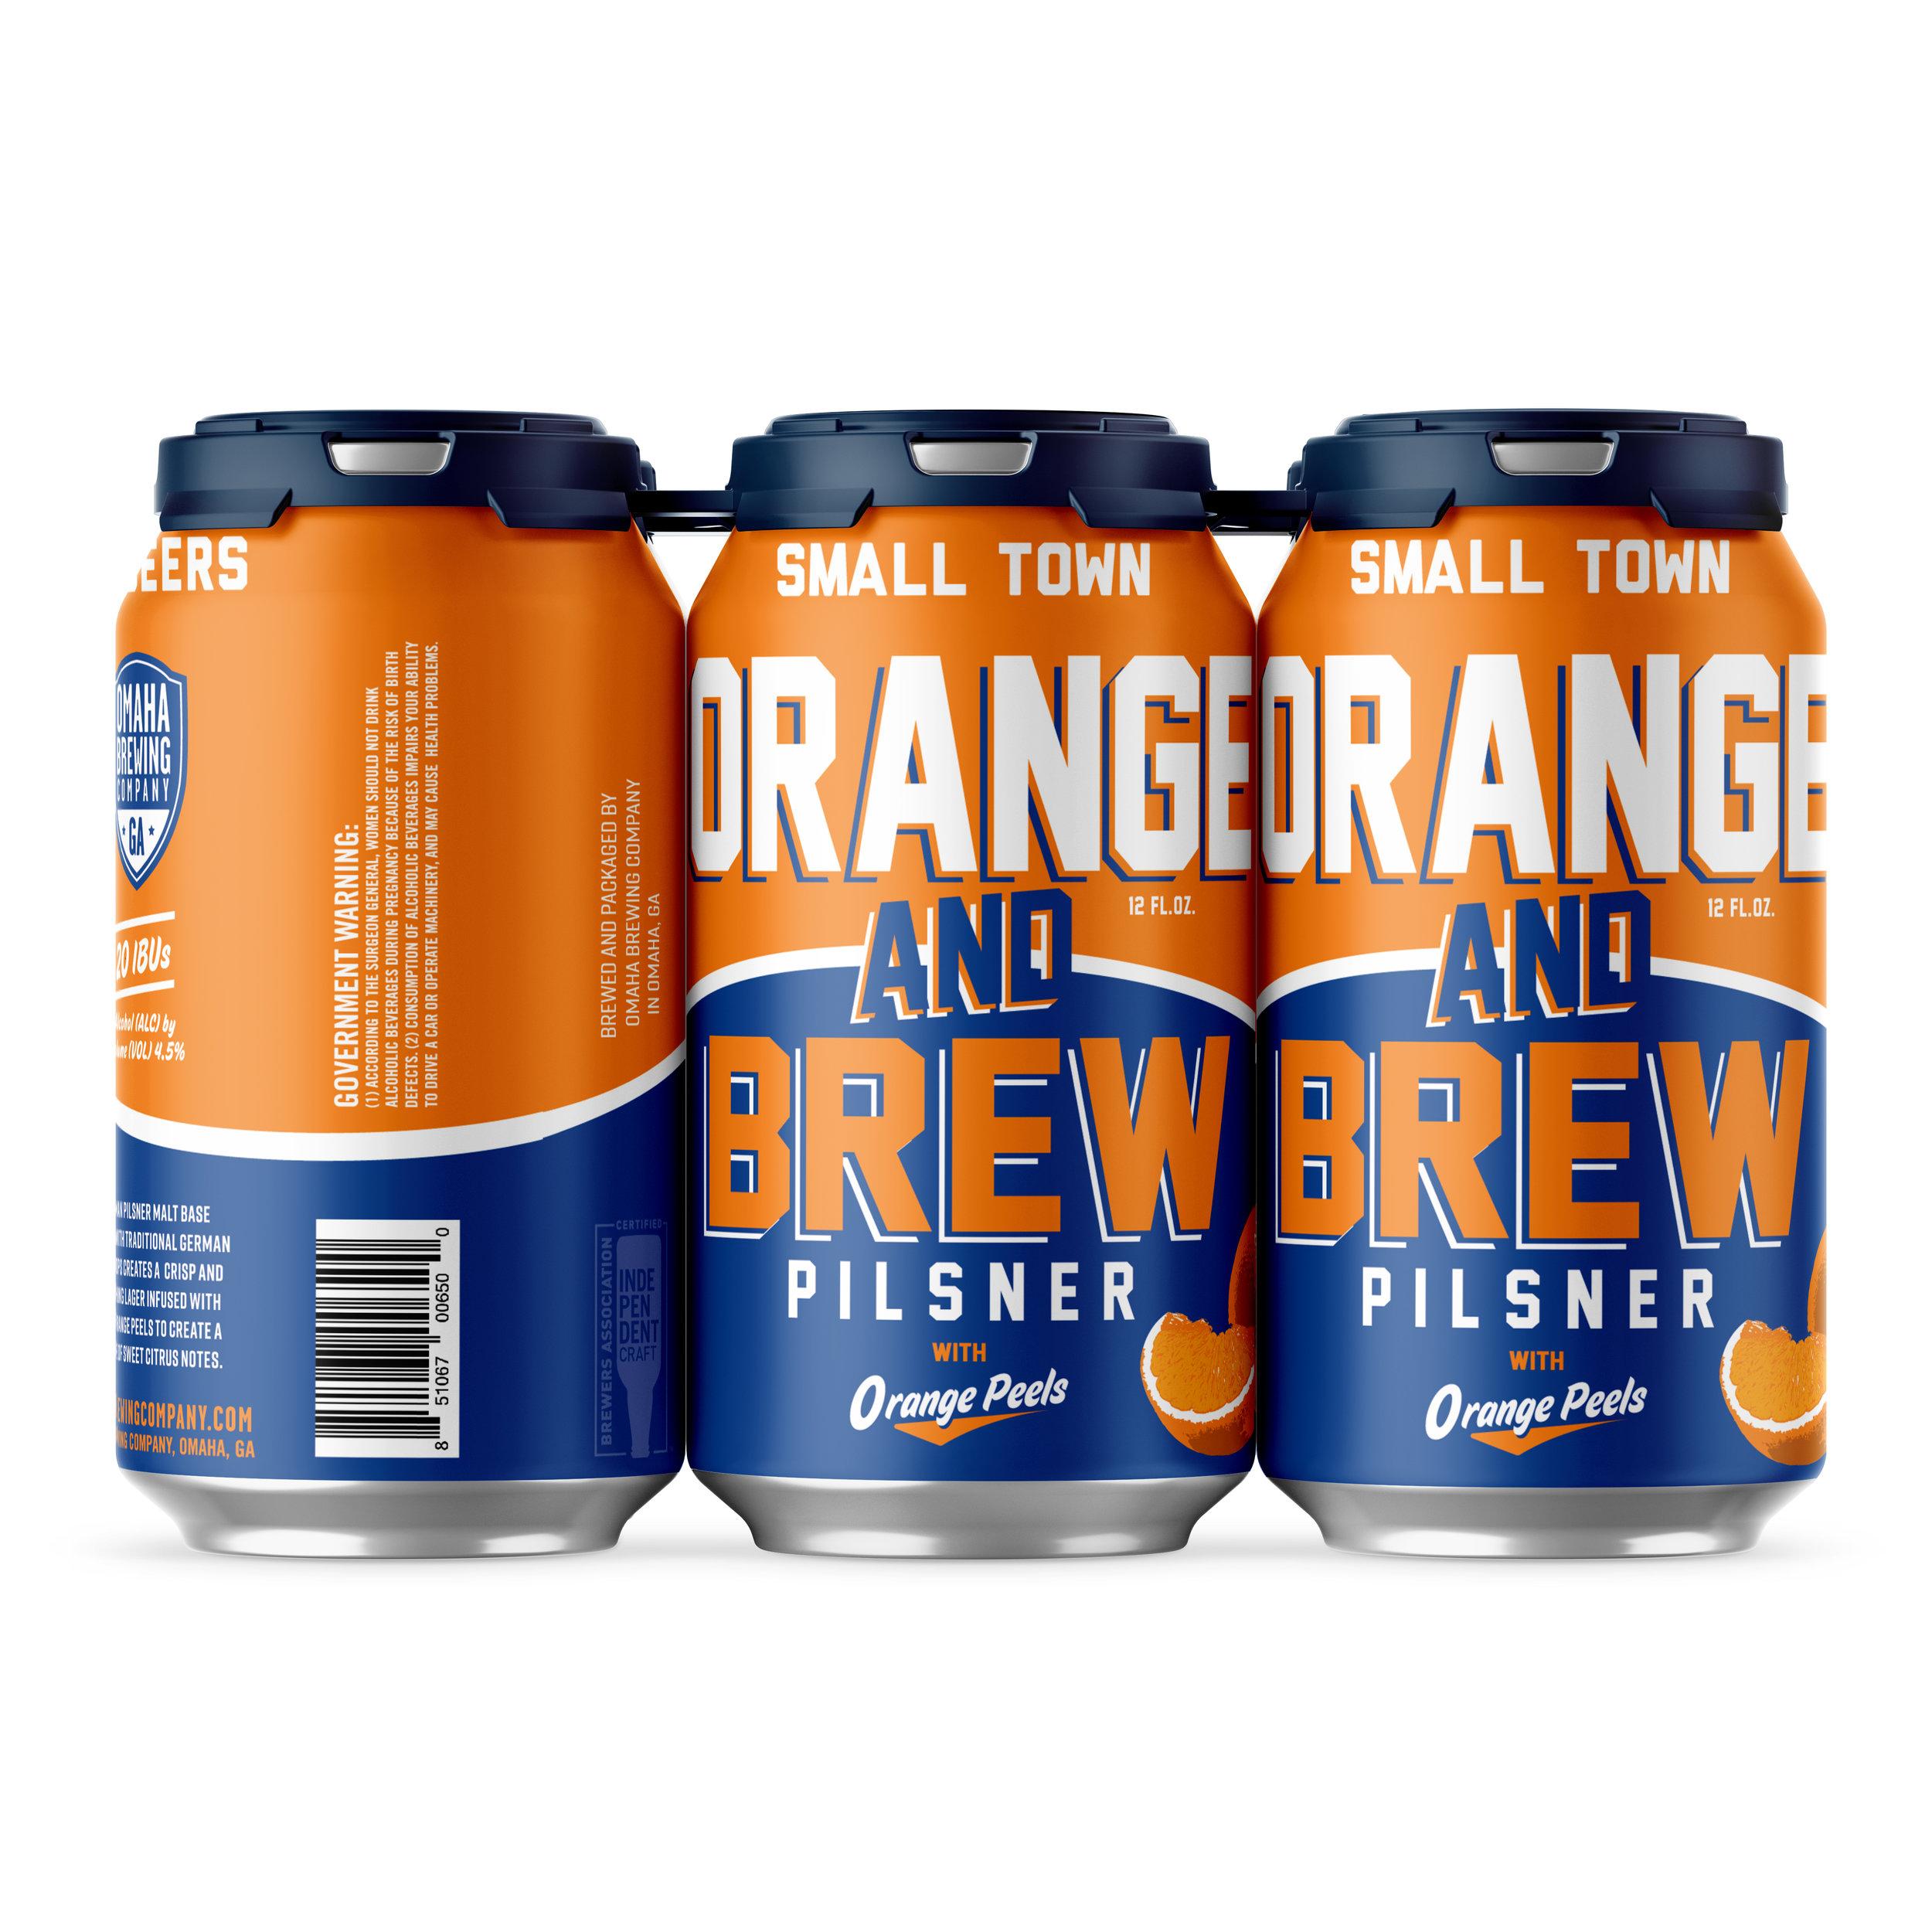 OrangeAndBrew.jpg